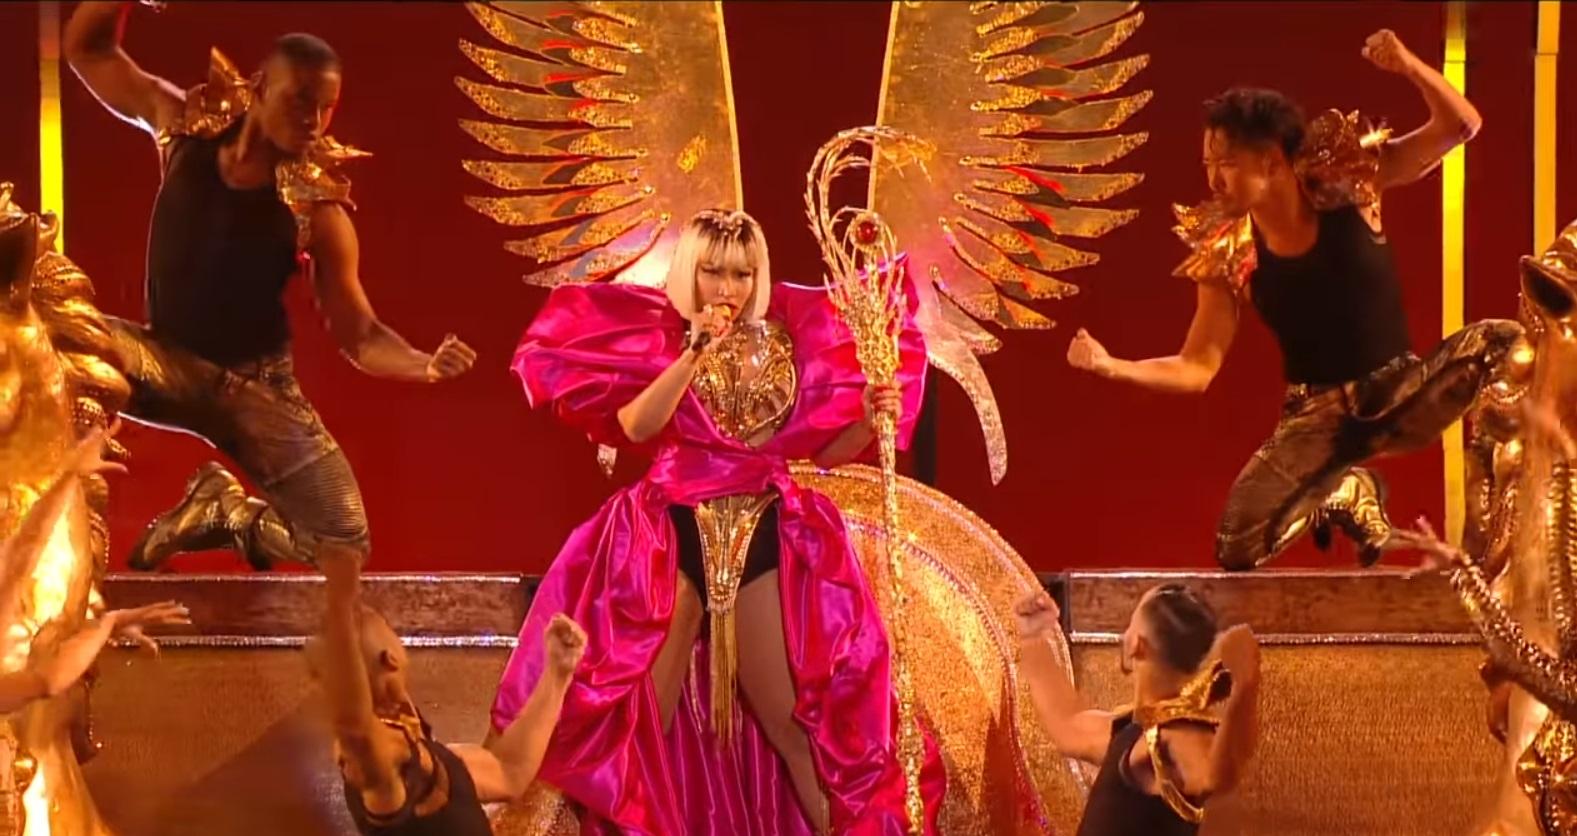 nicki_minaj_performs_majesty_barbie_dreams_ganga_burn_fefe_mtv_vmas.jpg